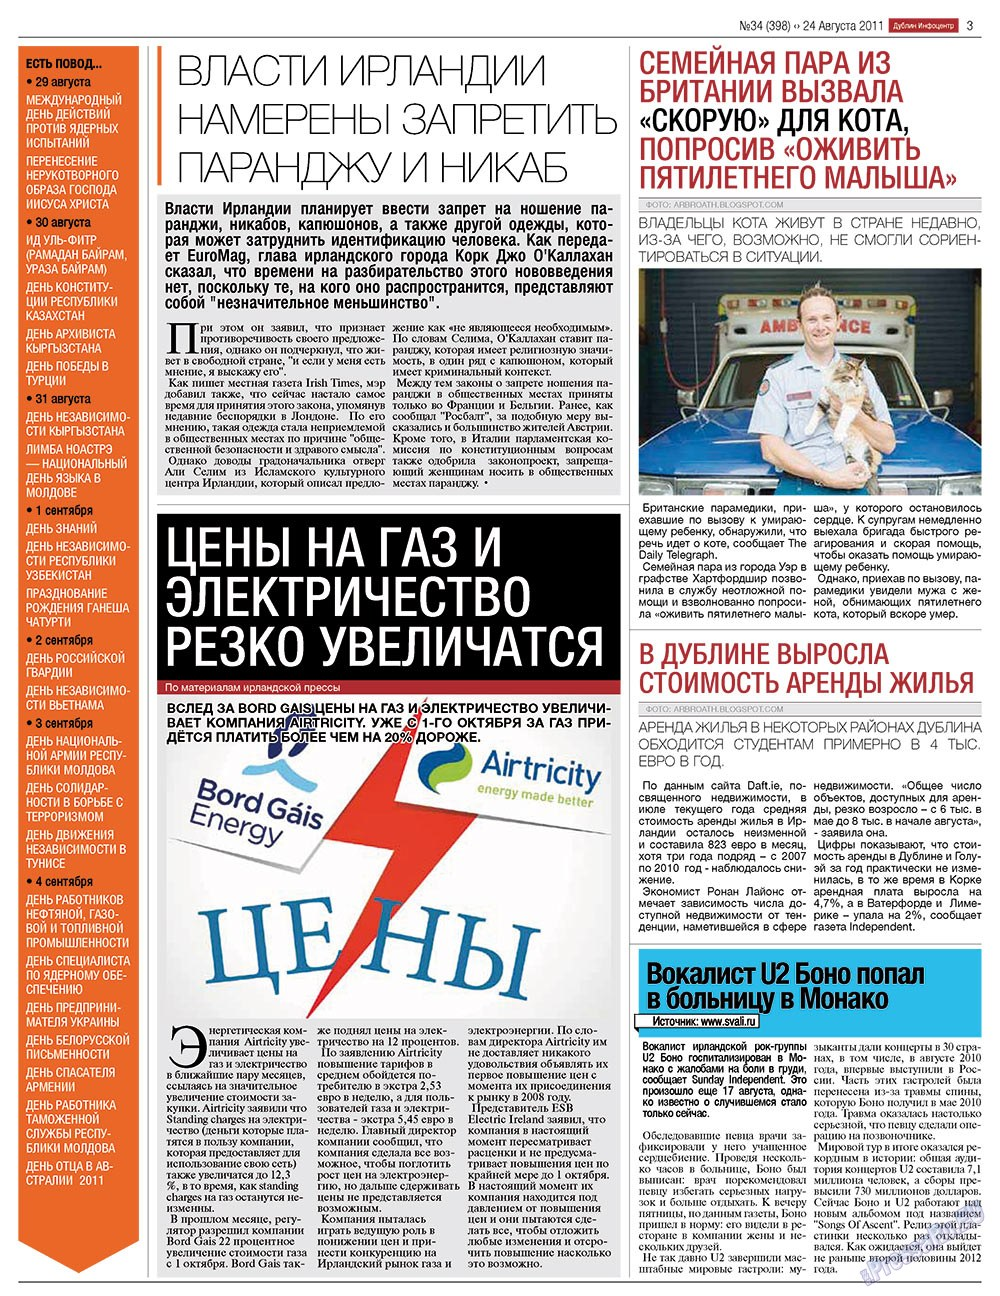 Дублин инфоцентр (газета). 2011 год, номер 34, стр. 3